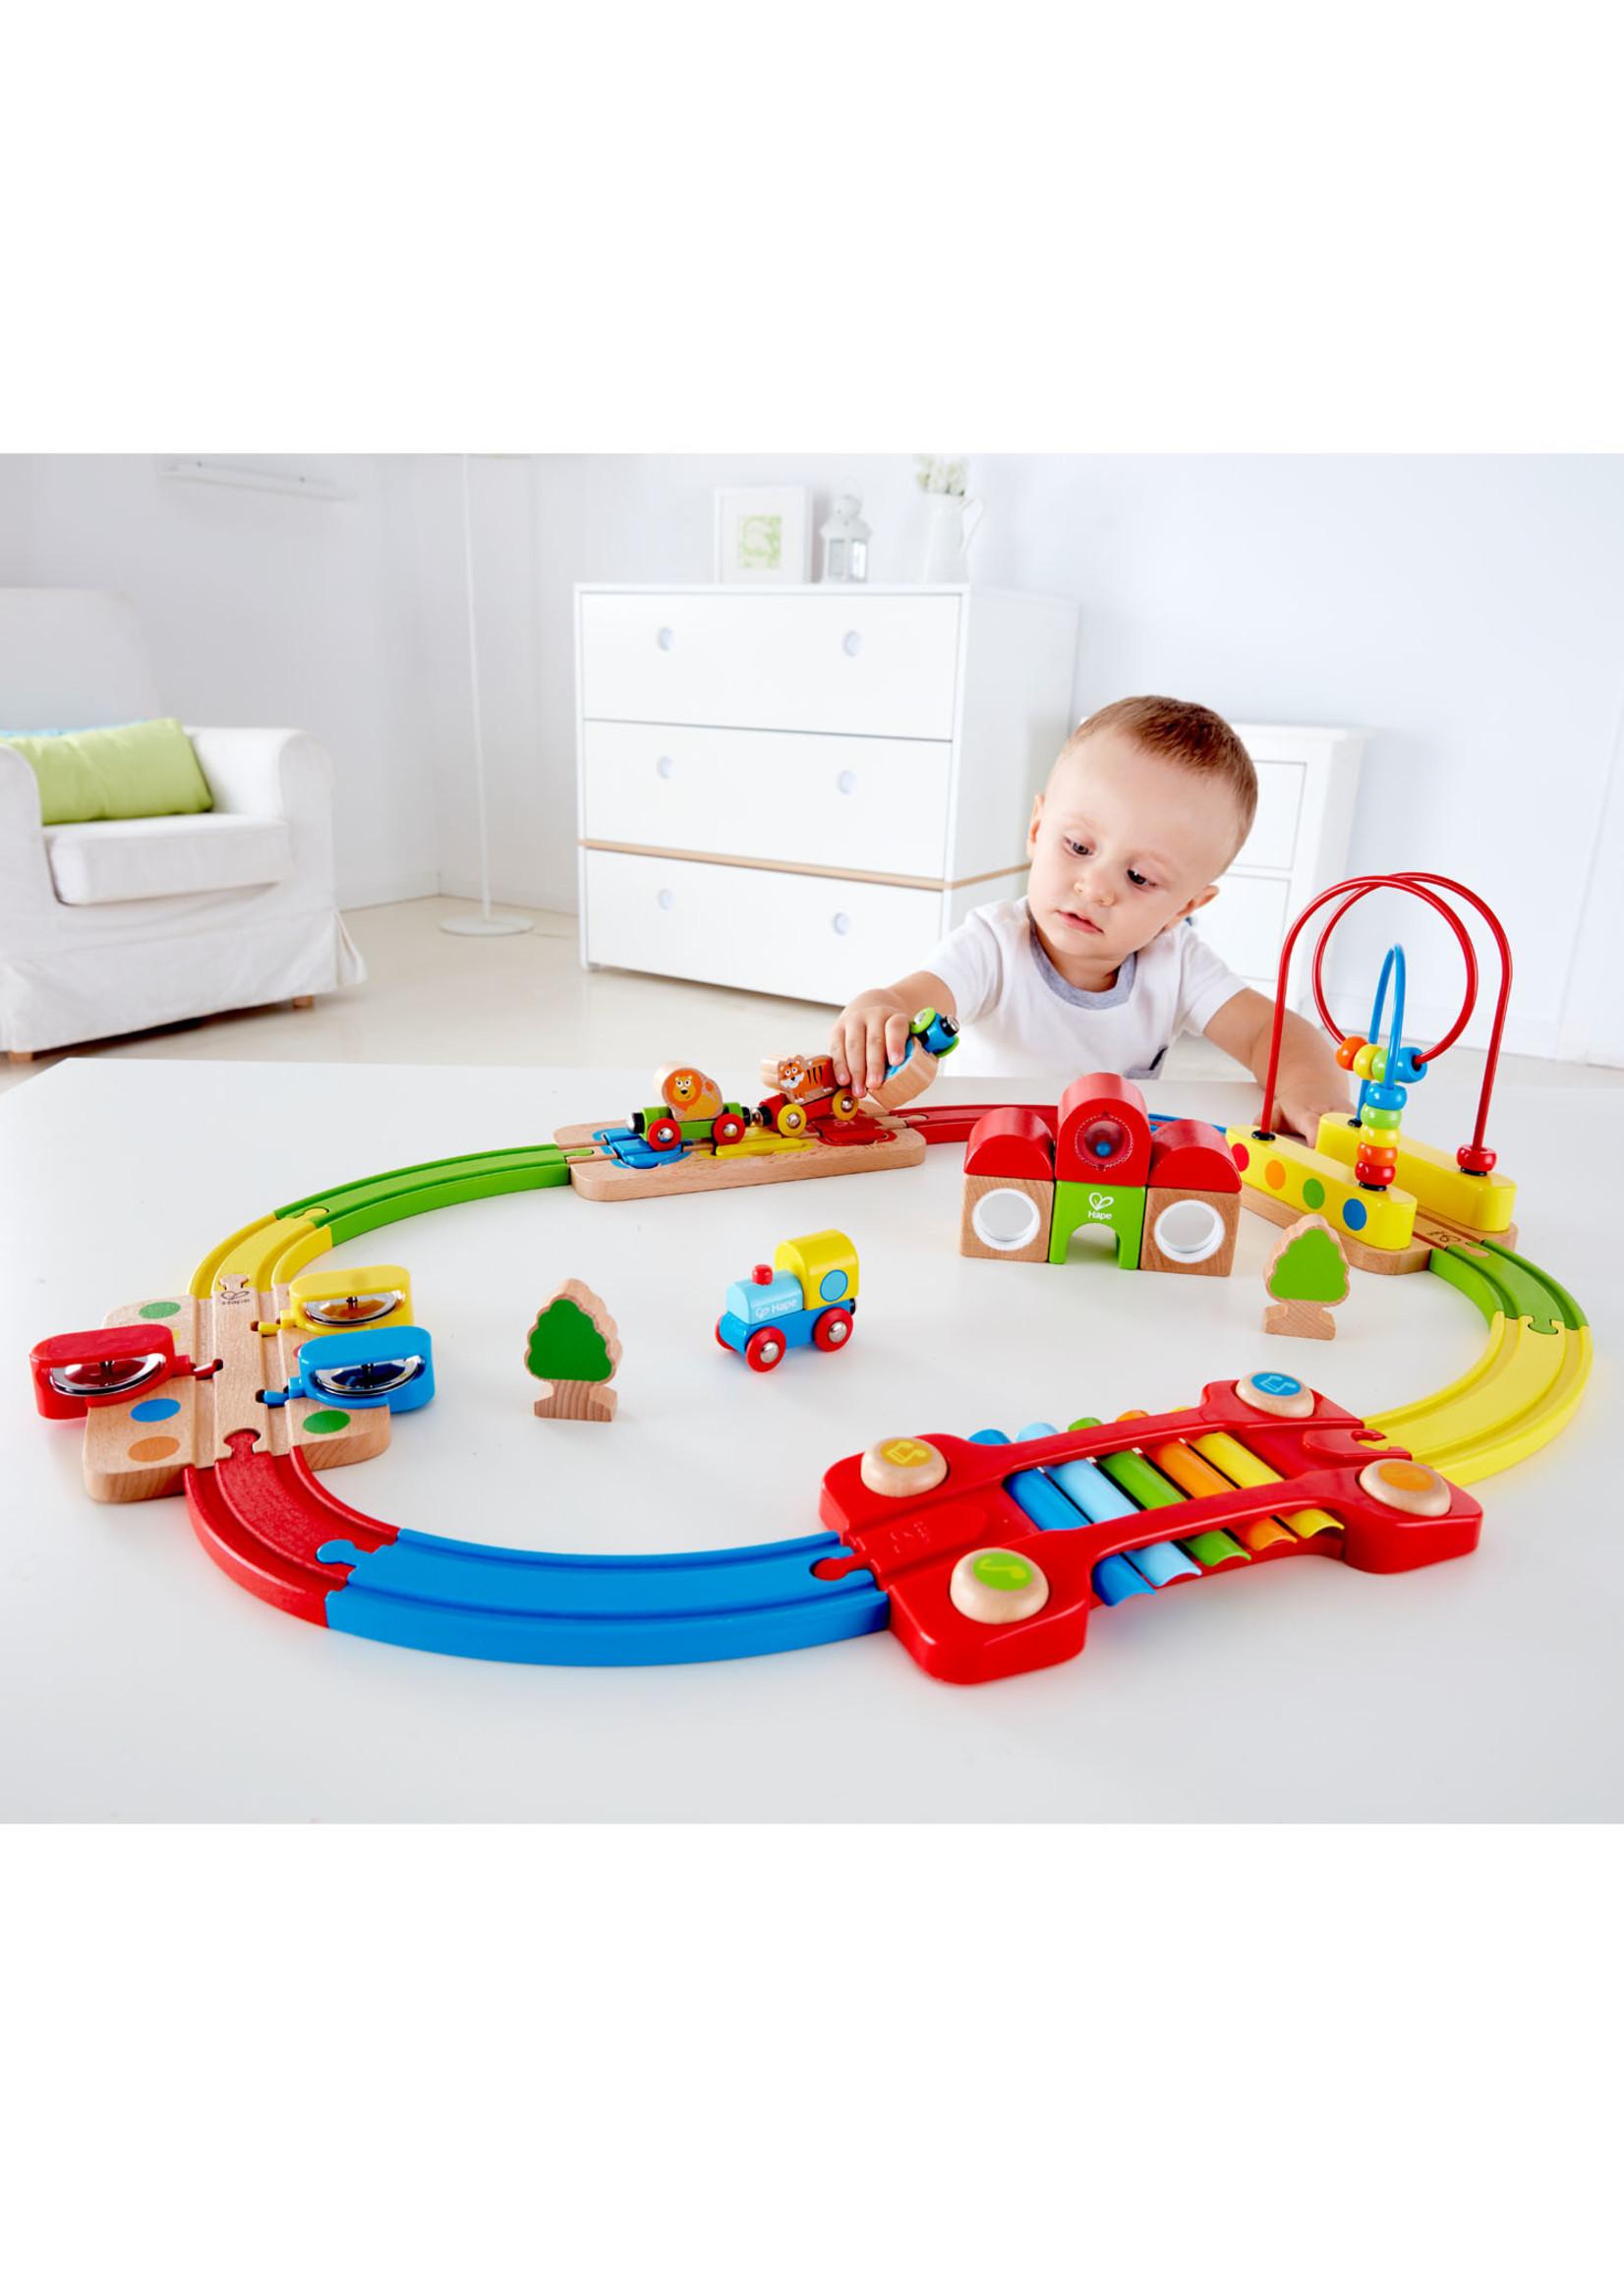 Hape Hape Rainbow Puzzle Railway